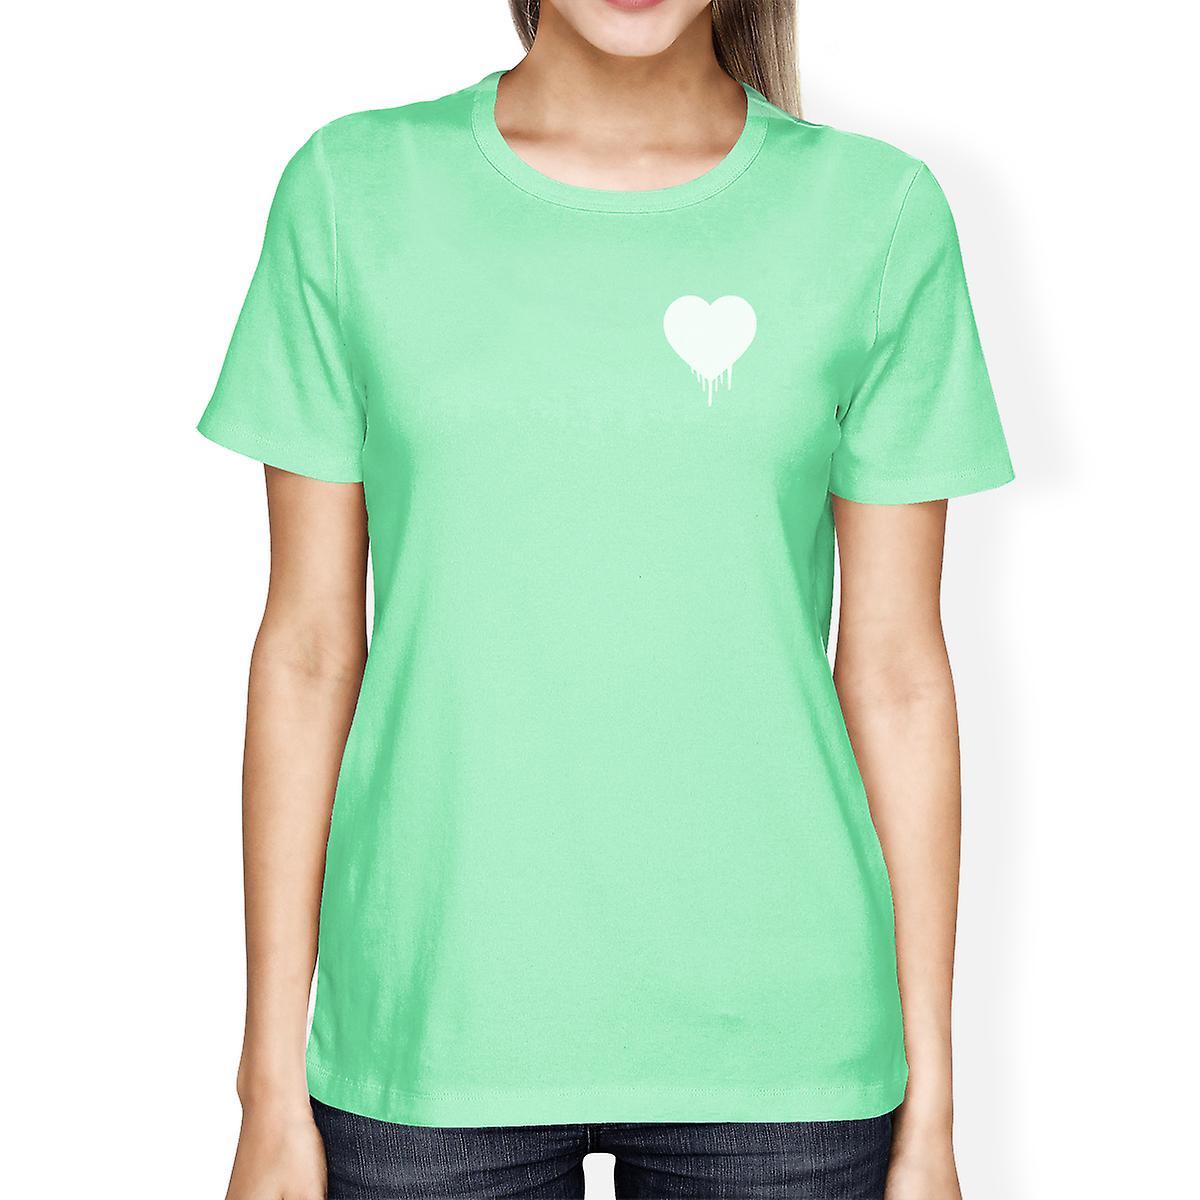 Hustler womens t-shirts — pic 7